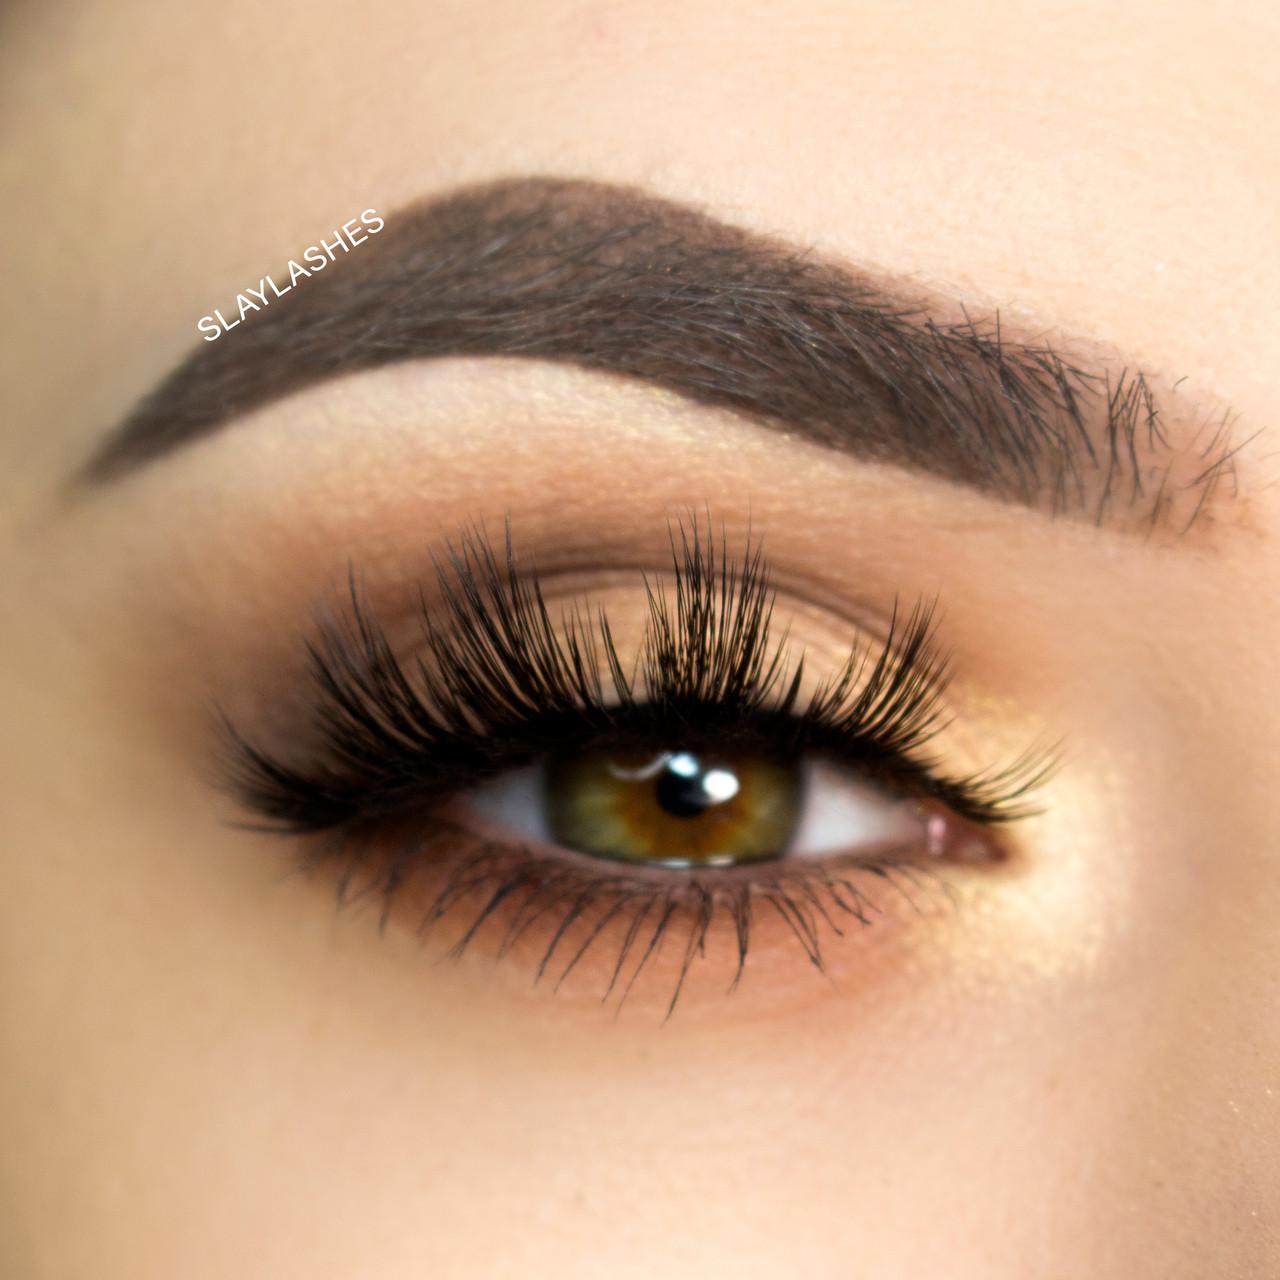 5f53f930bfd Stunner Silk Lashes - slaylashes Stunner Lashes , Synthetic, slaylashes,  false, lashes,